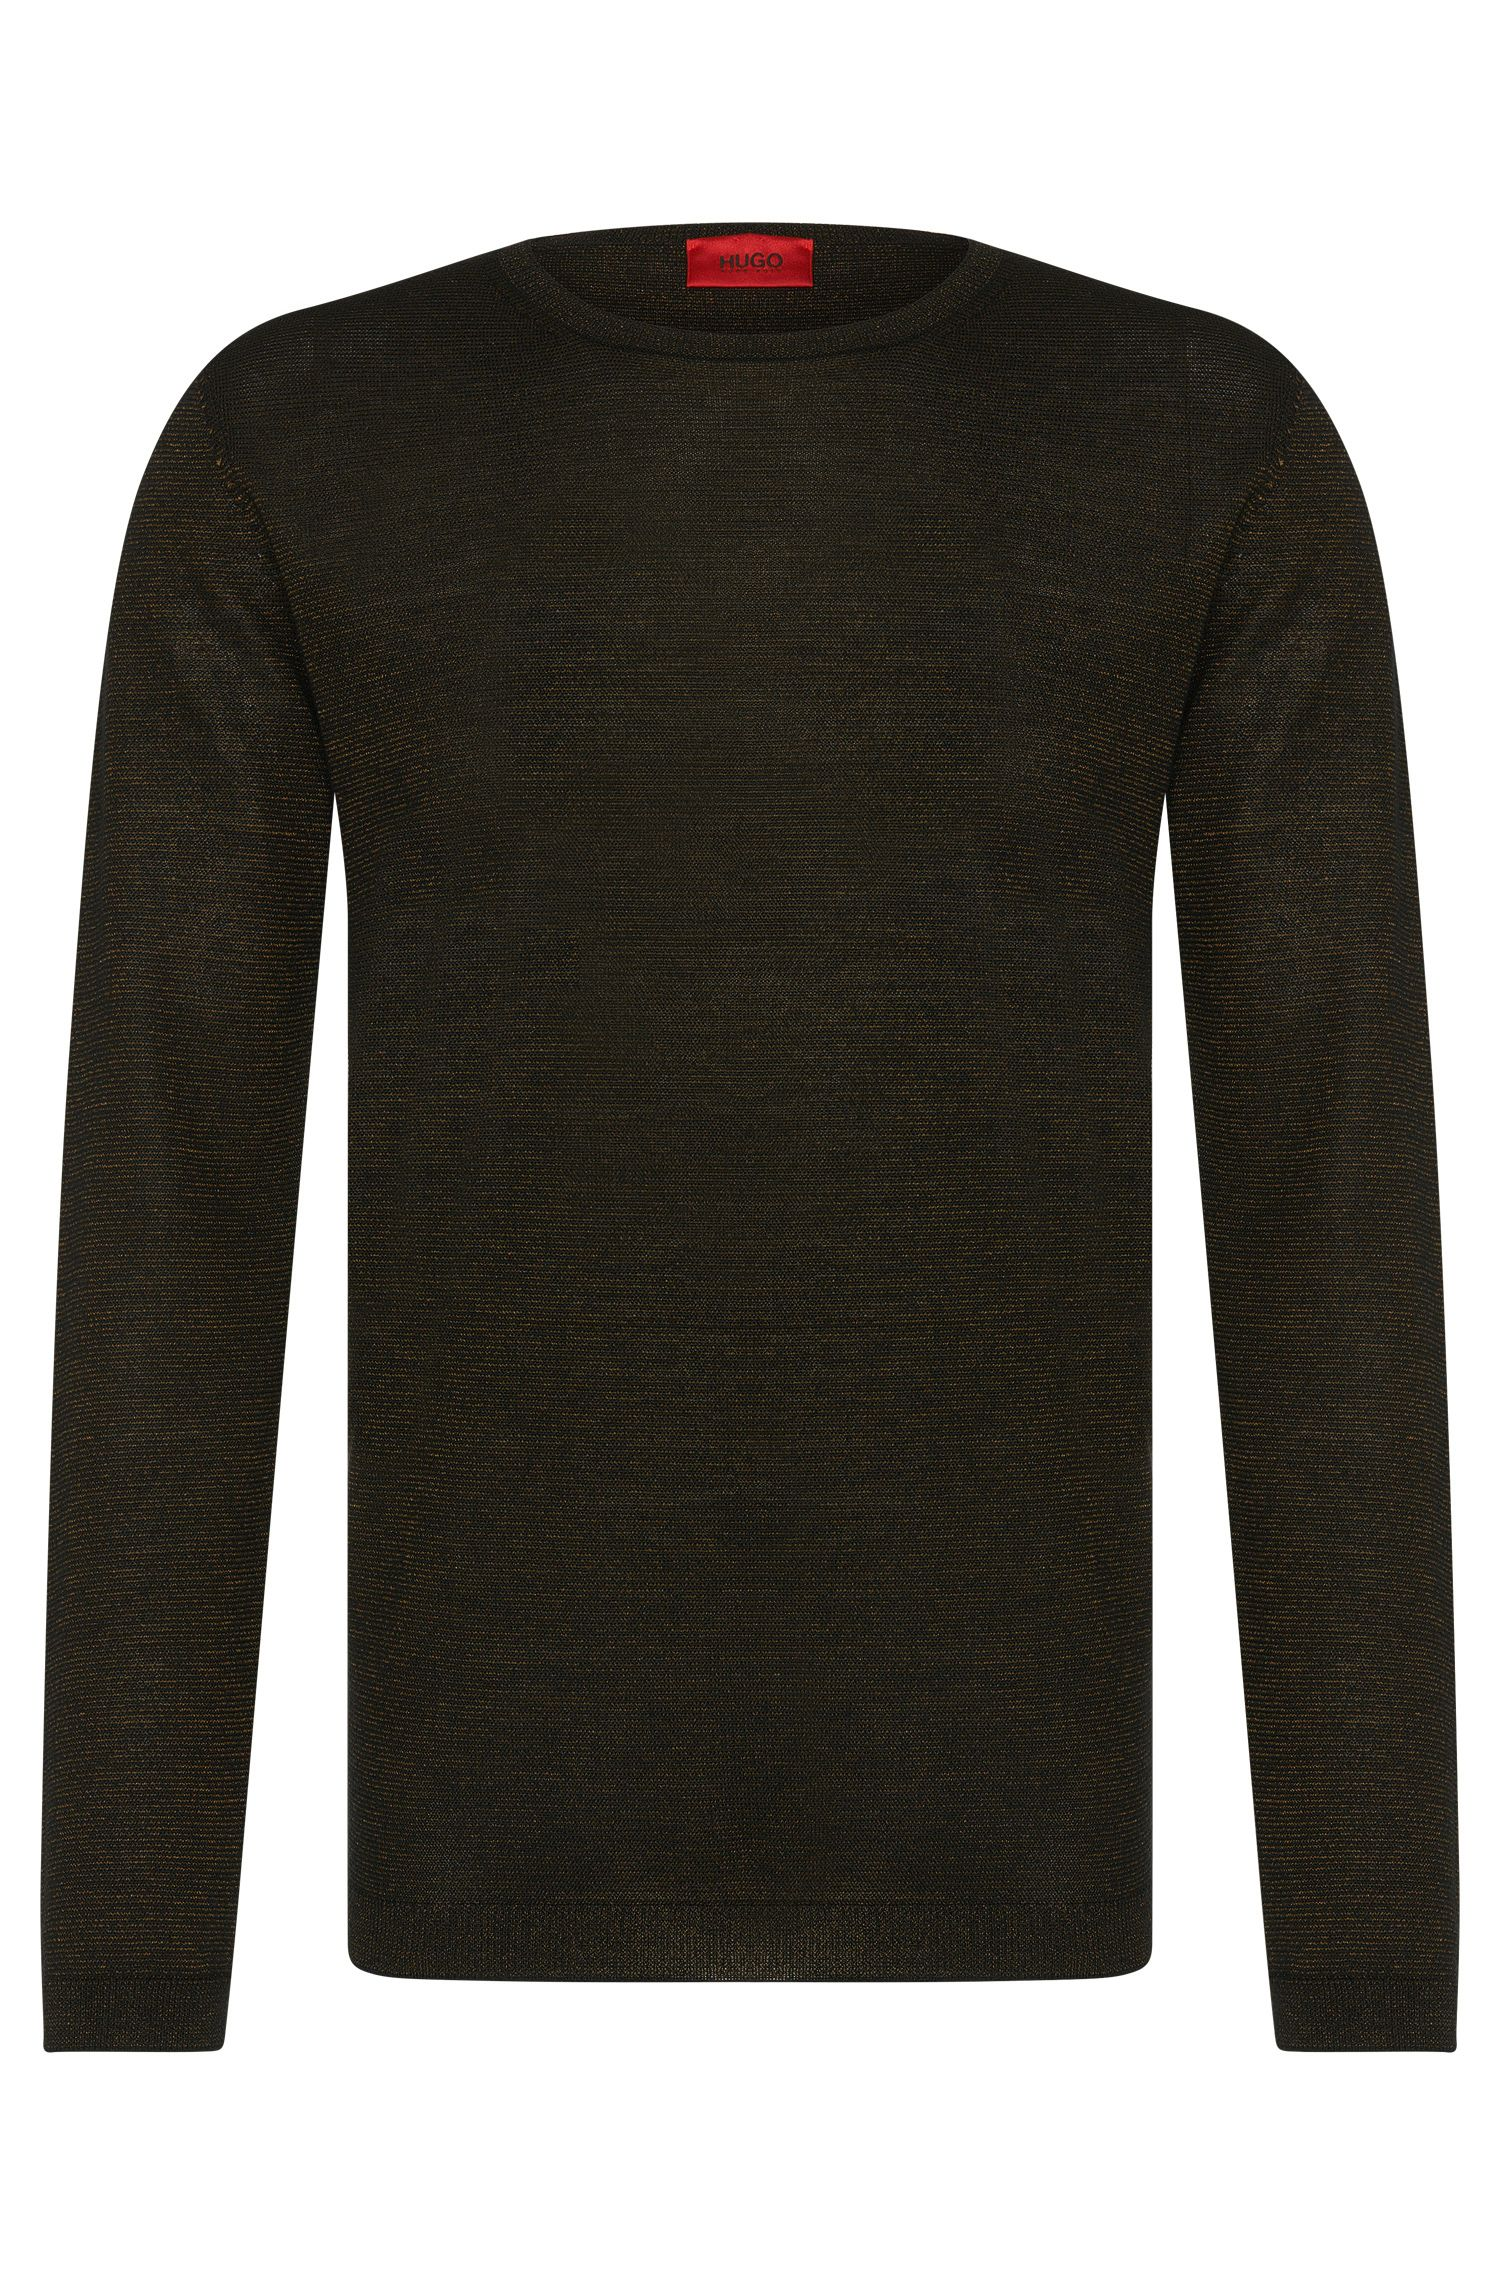 'Salex' | Merino Virgin Wool Blend Metallic Stripe Sweater